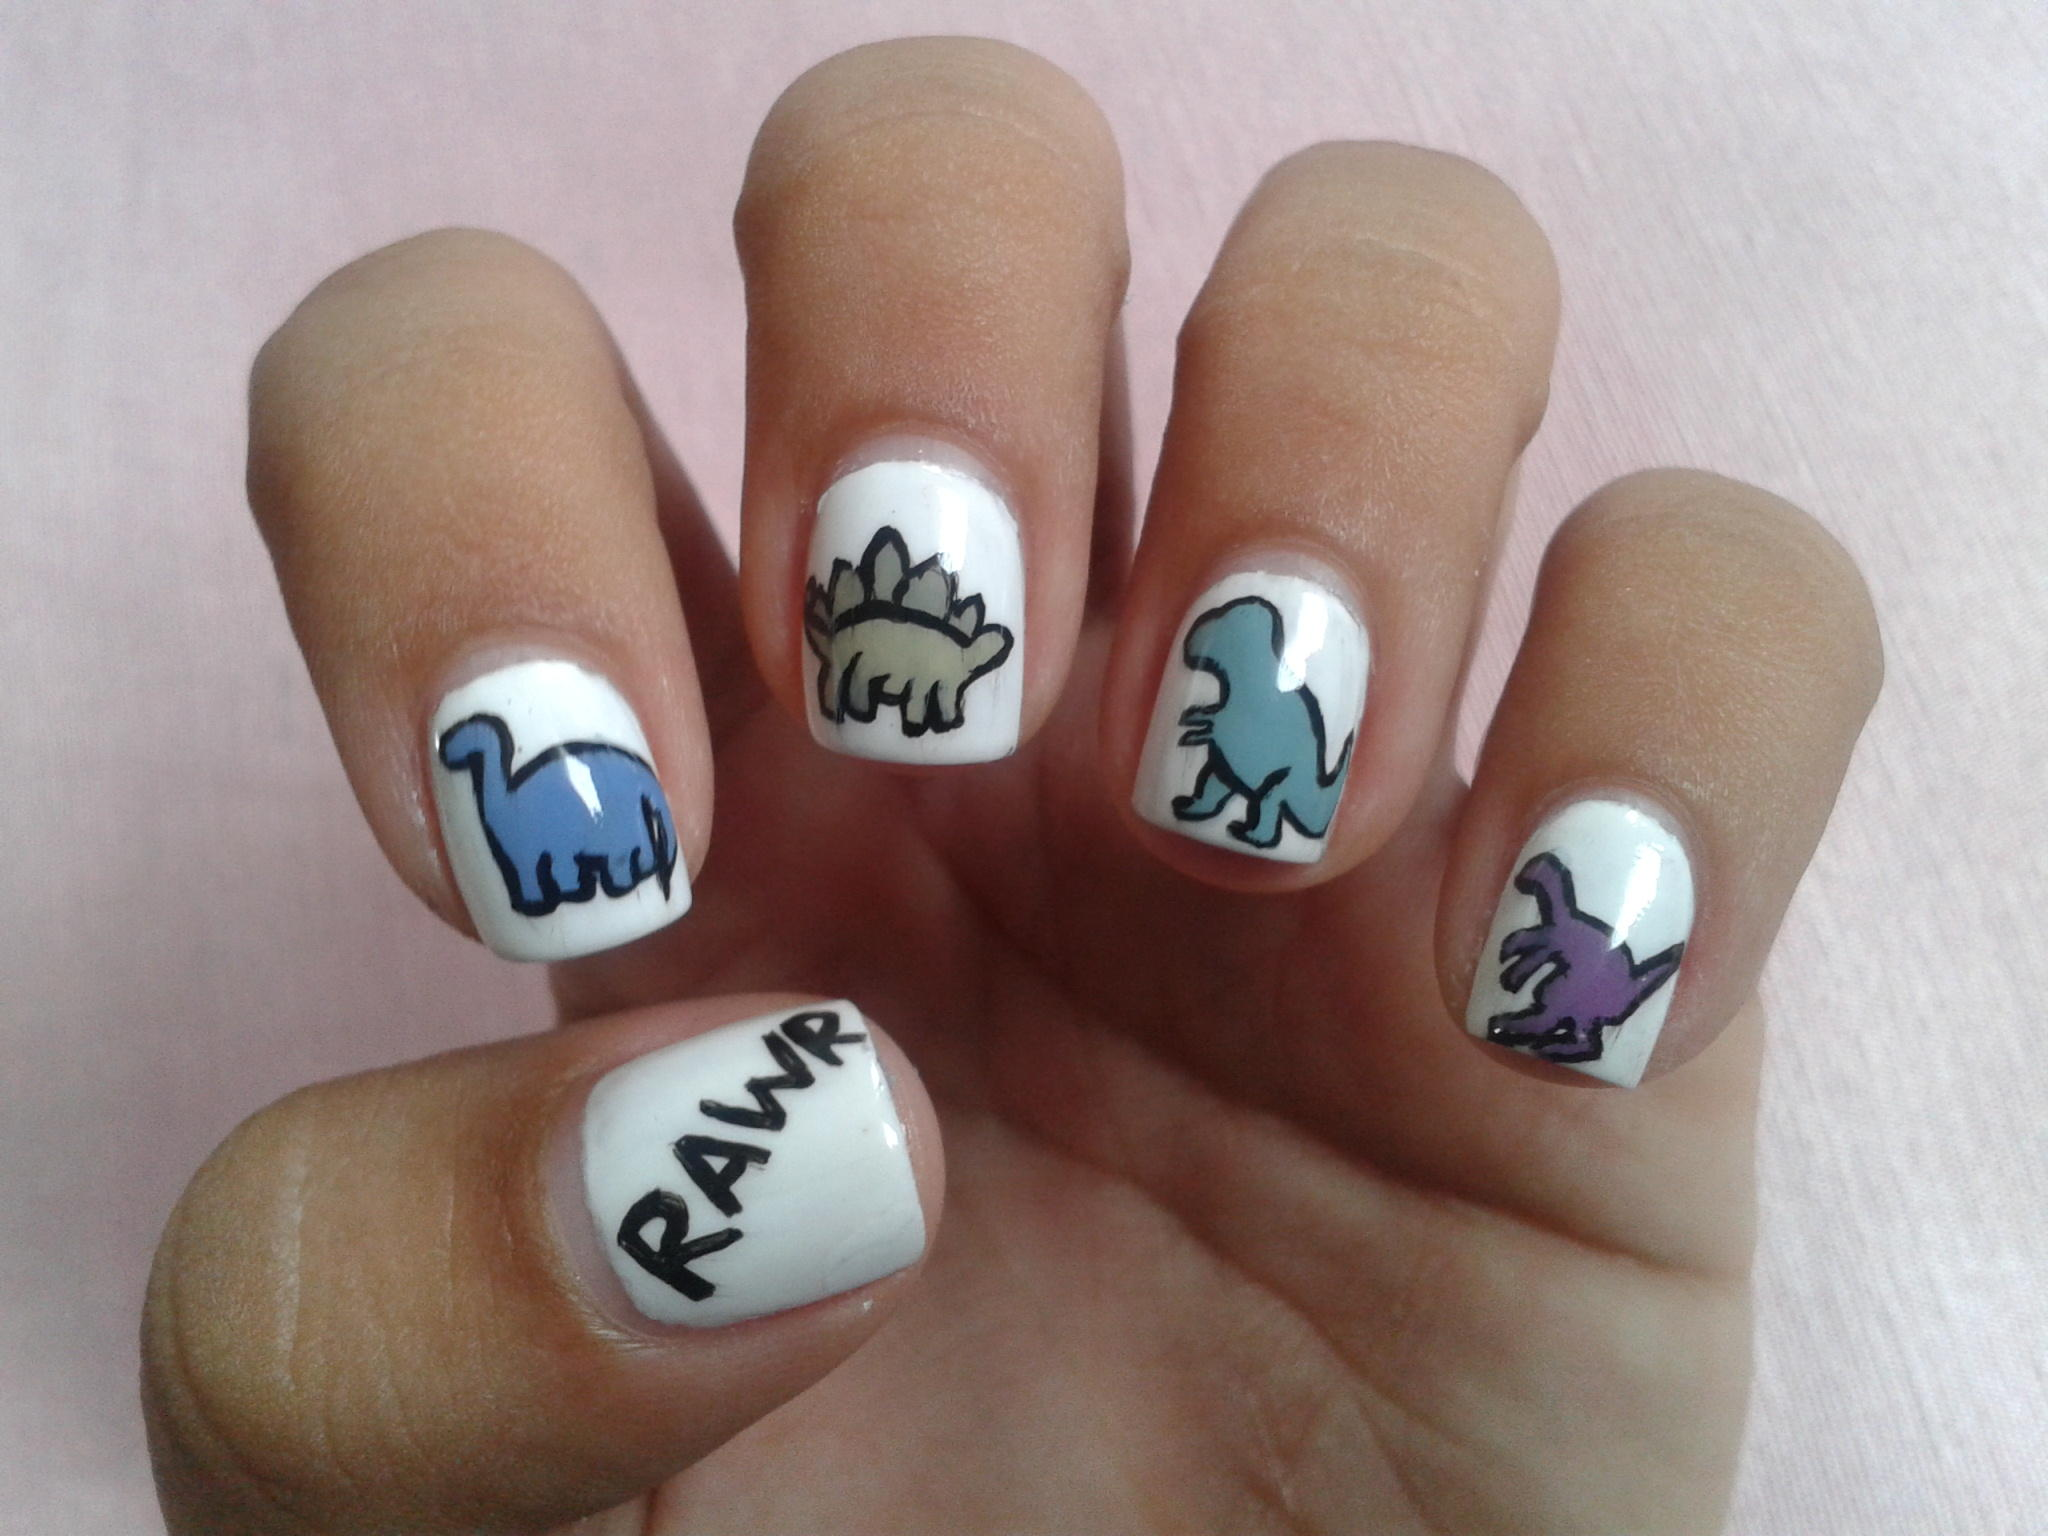 RAWR! Dinosaur #NailArt :D http://t.co/0VeOe4Gy